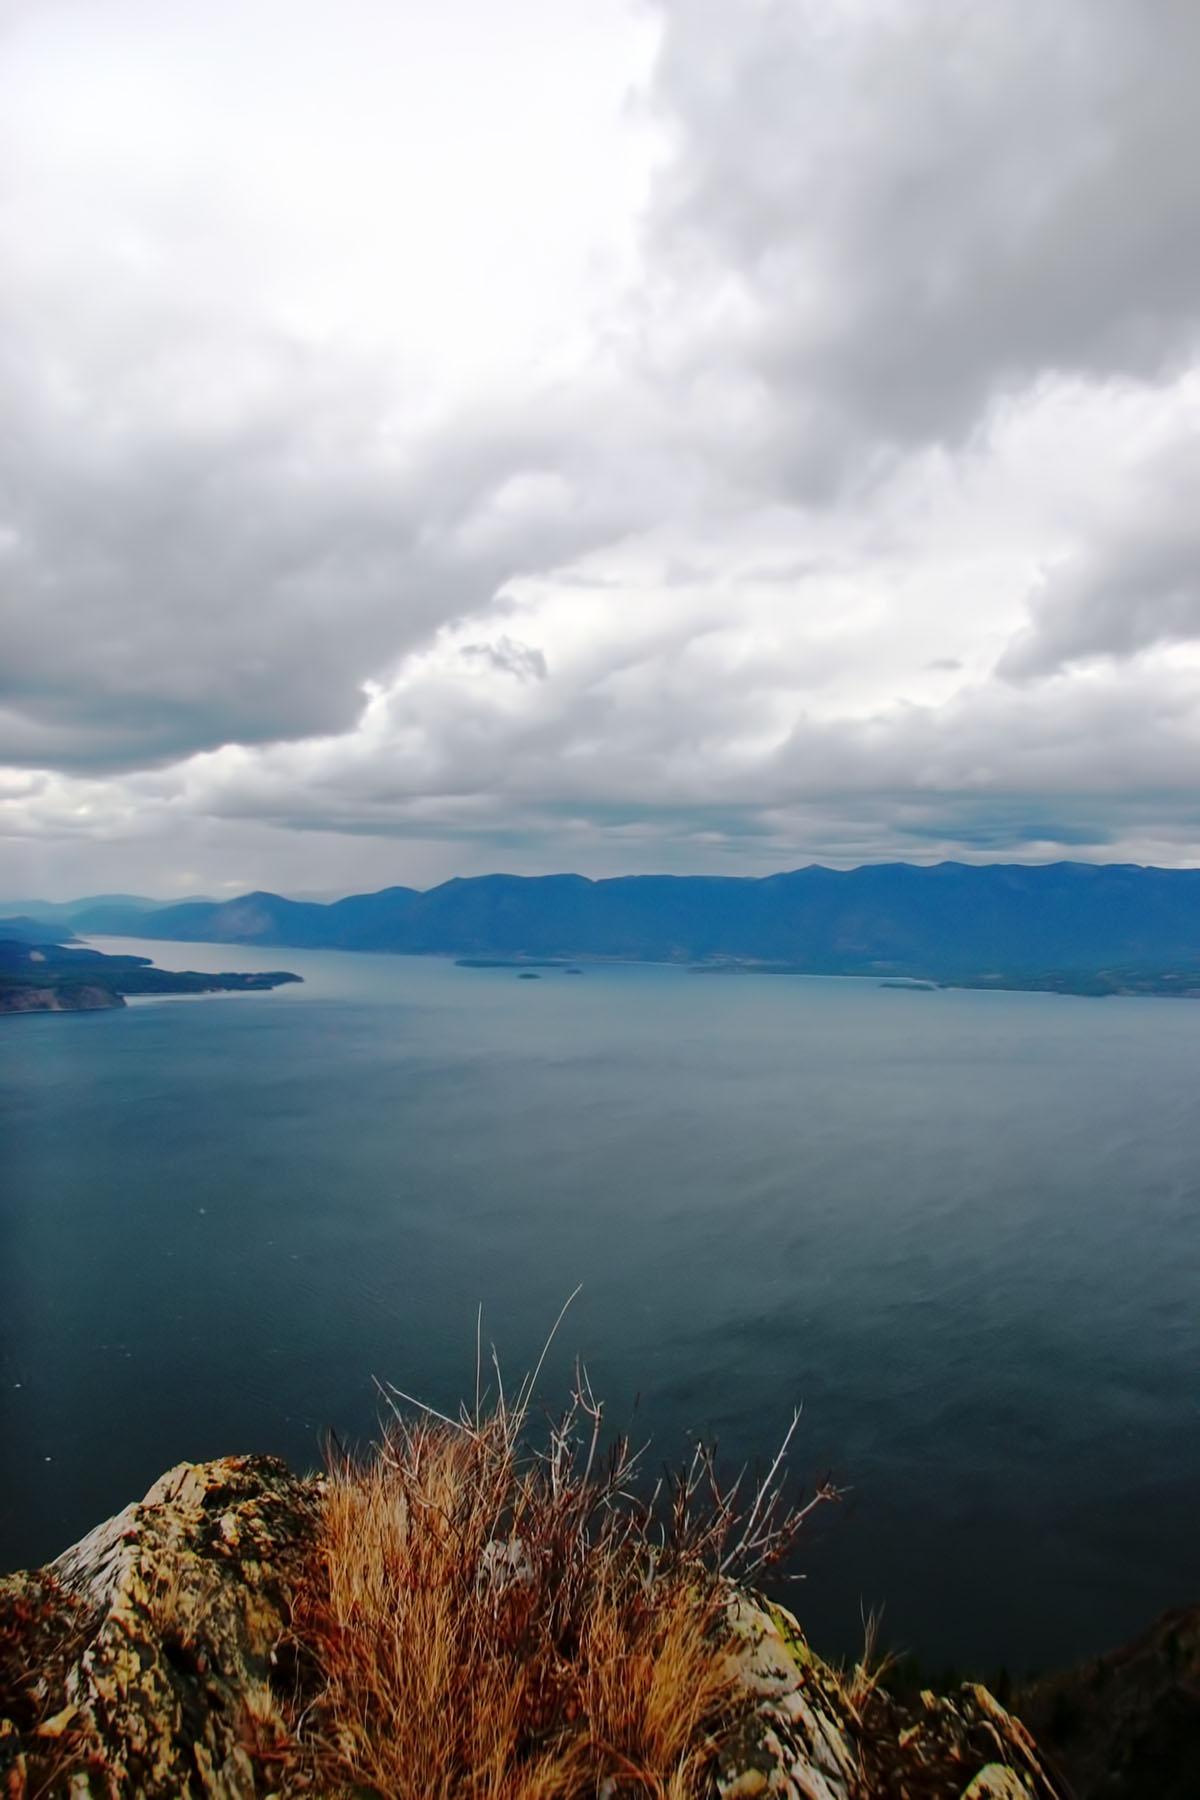 Đất đai vì Bán tại Spectacular Views of Lake Pend Orielle grace this 137 acres NNA Highdrive 137 acres Clark Fork, Idaho, 83811 Hoa Kỳ